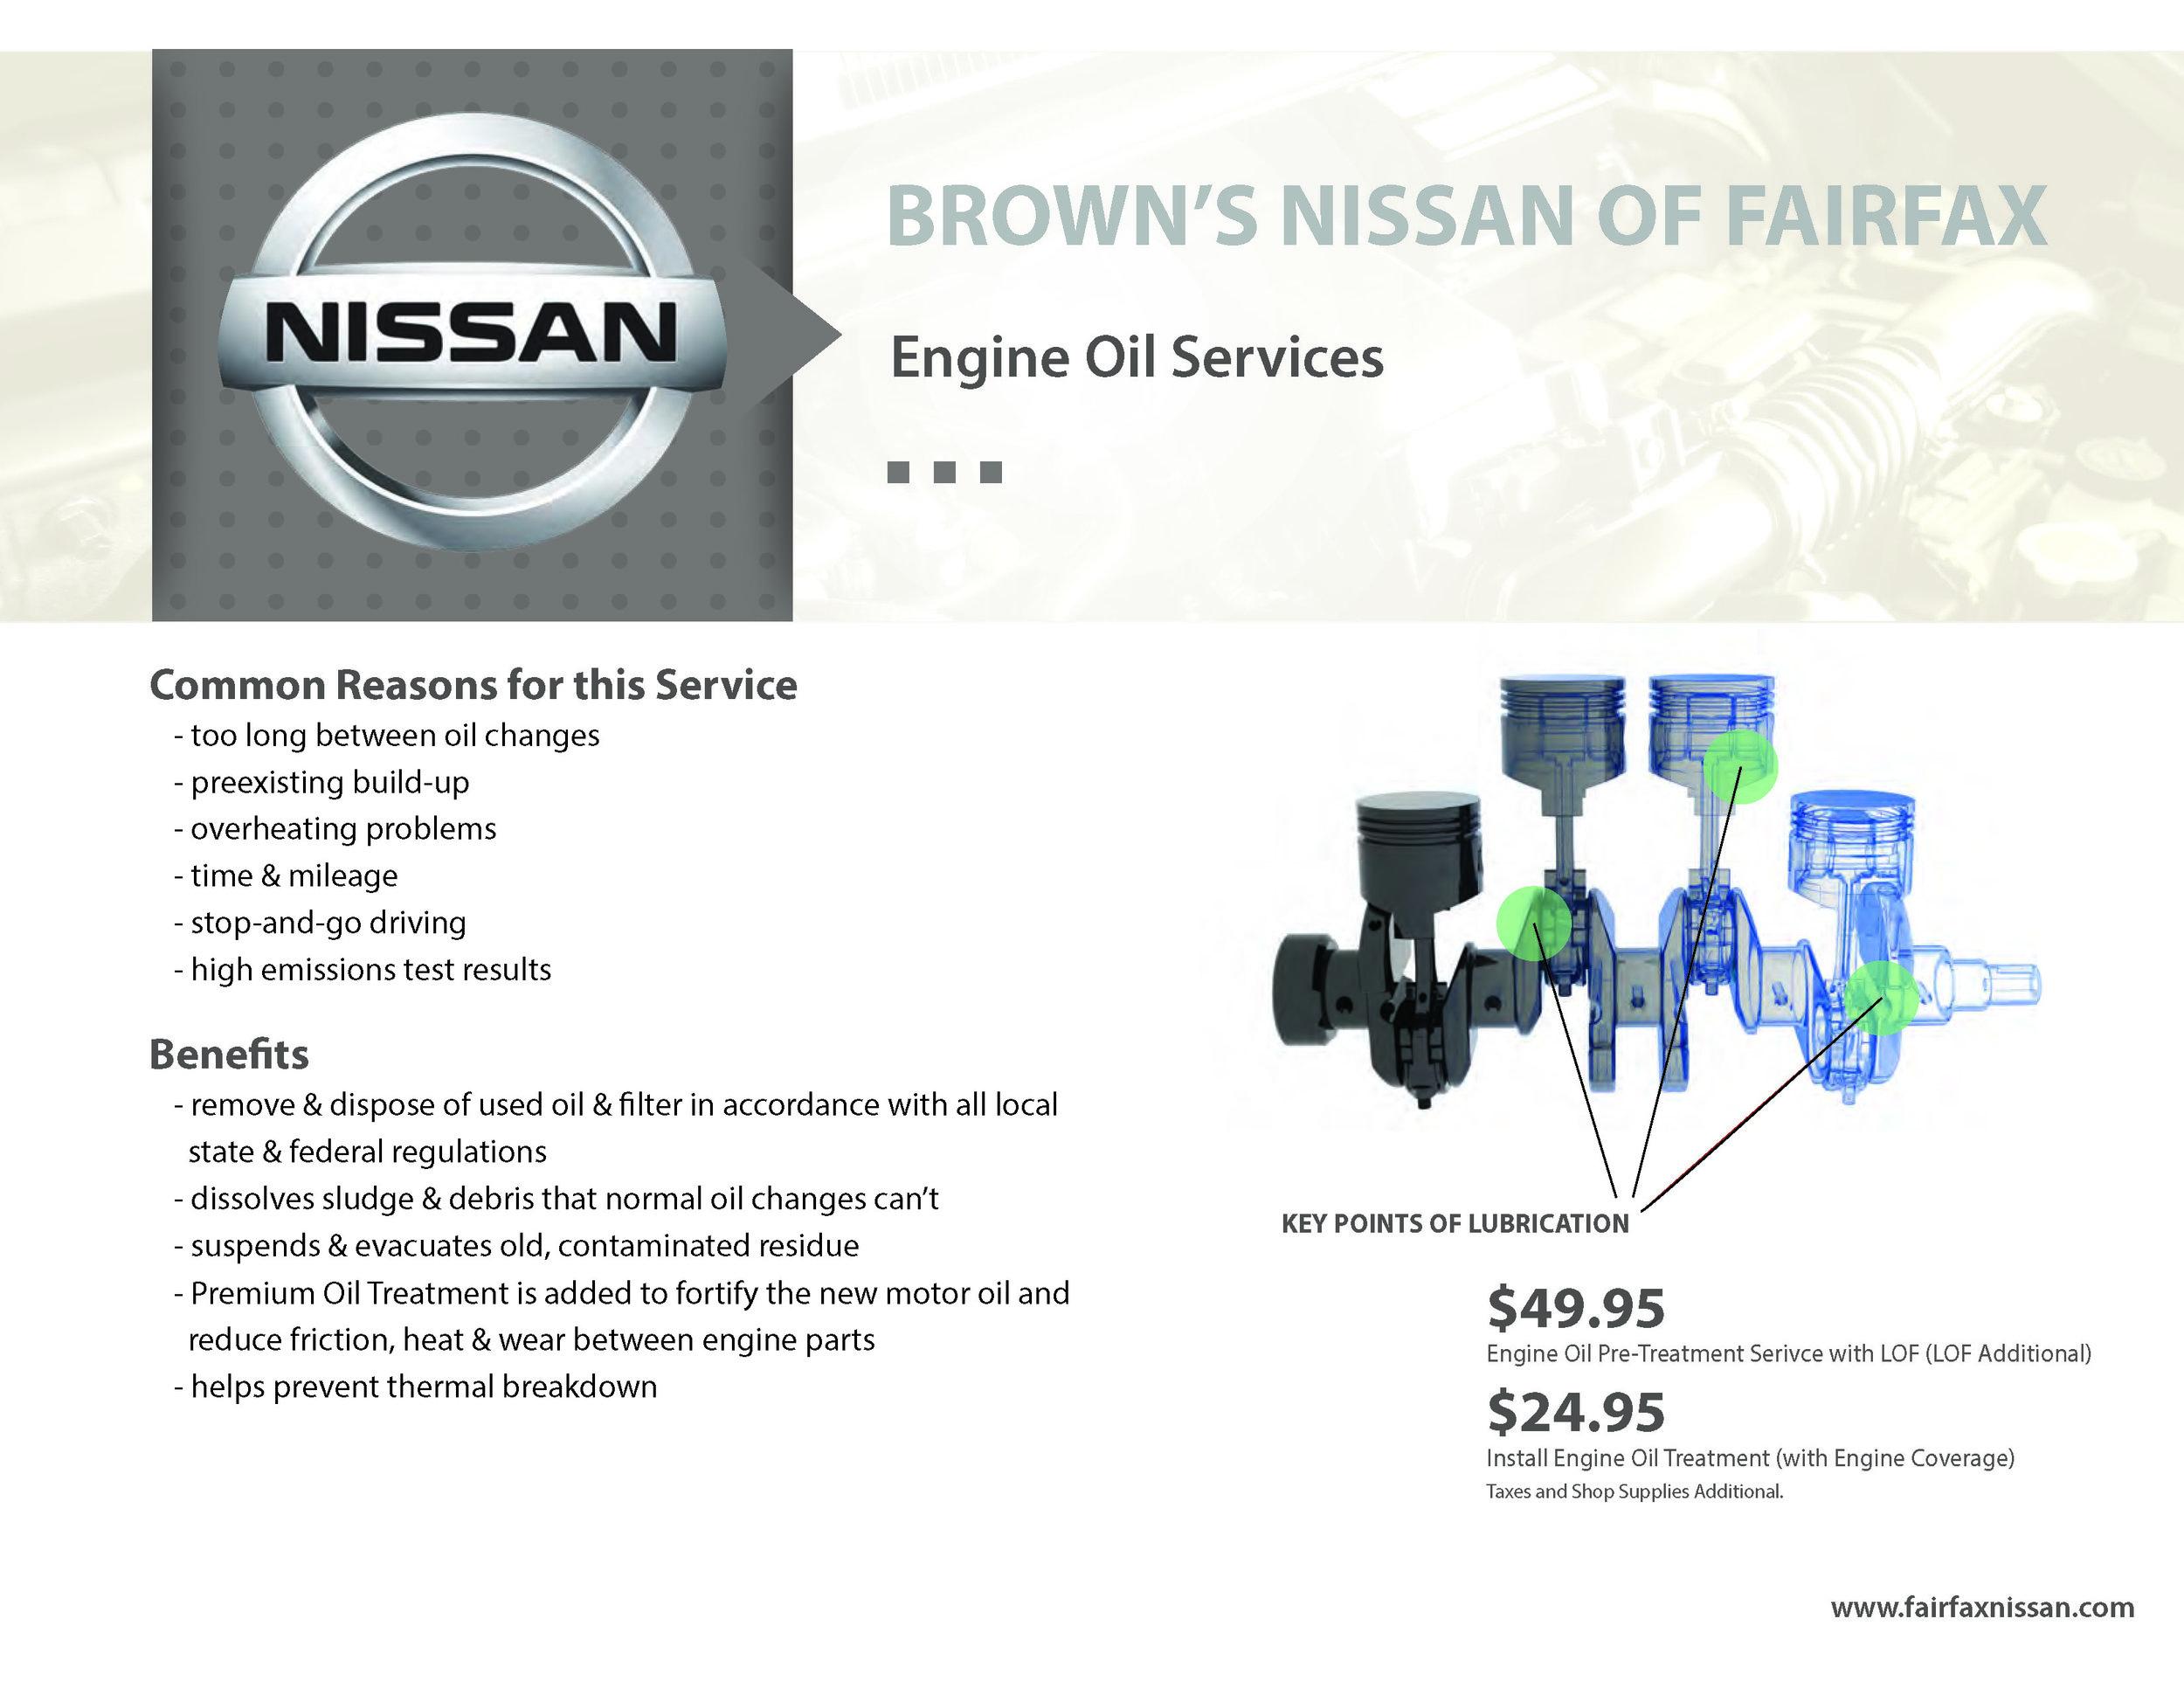 Browns Nissan of Fairfax - MG2.jpg